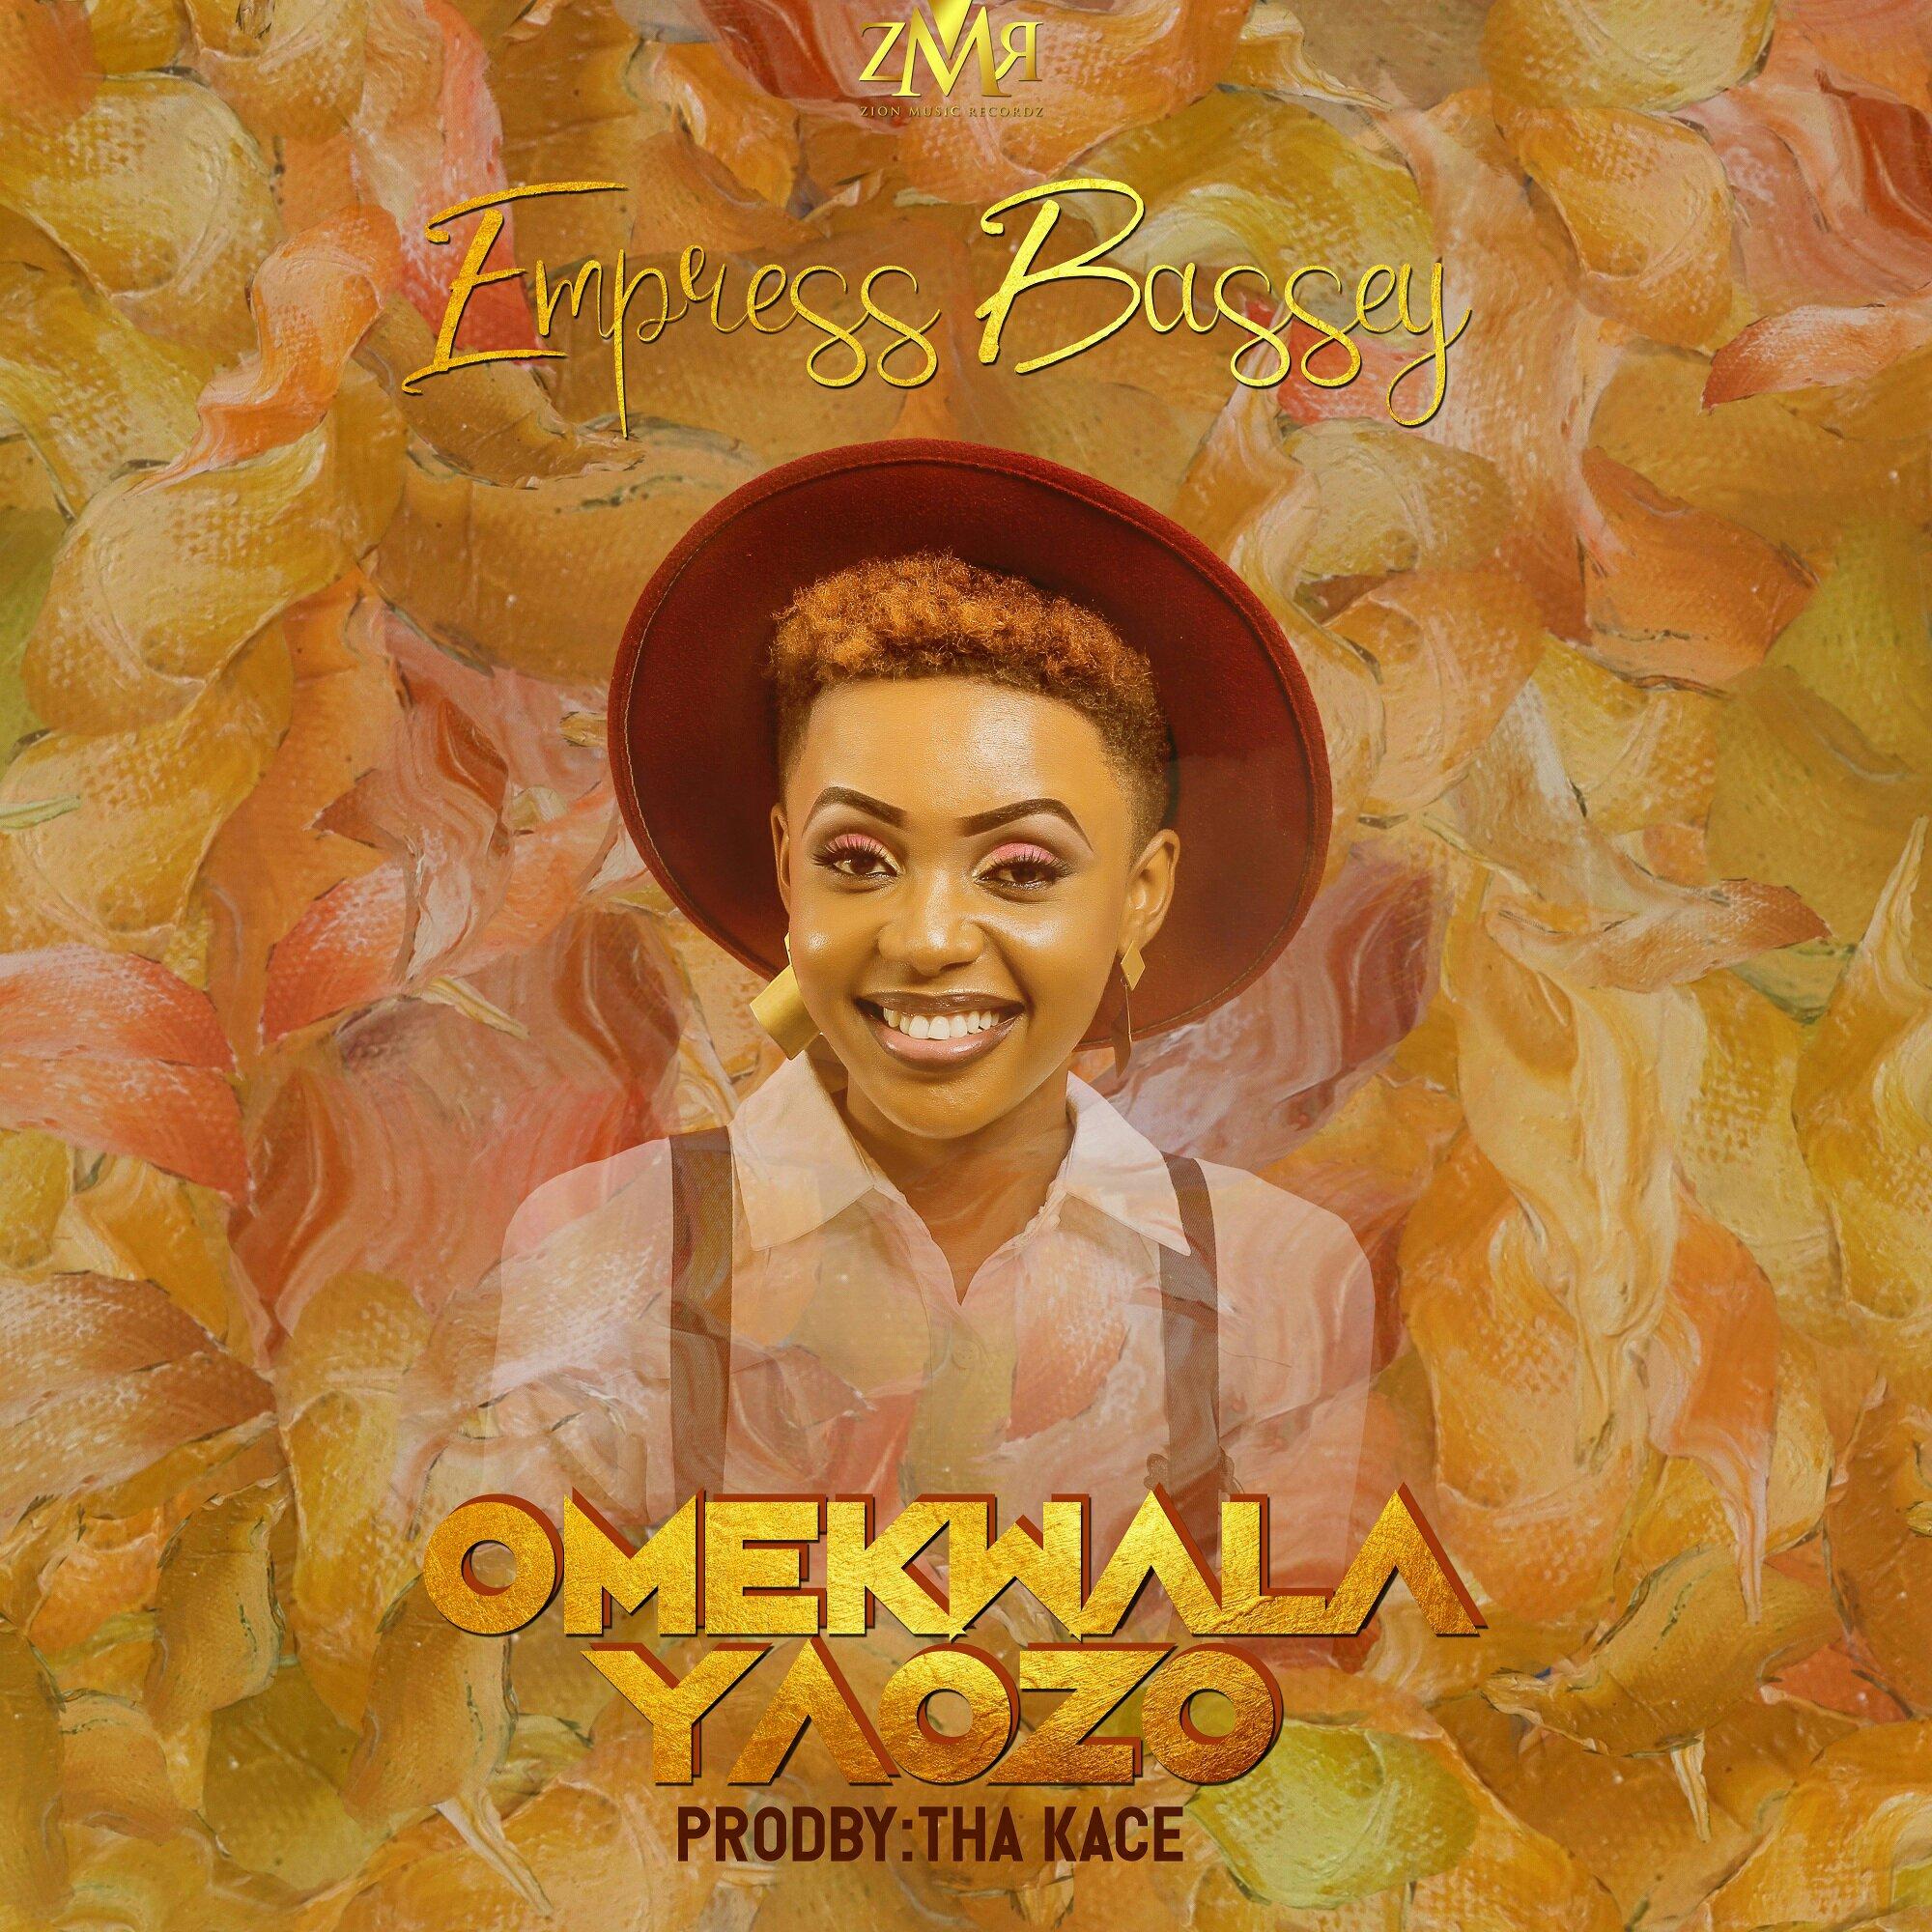 DOWNLOAD Music: Empress Bassey – OMEKWALAYAOZO (He Did It Again)